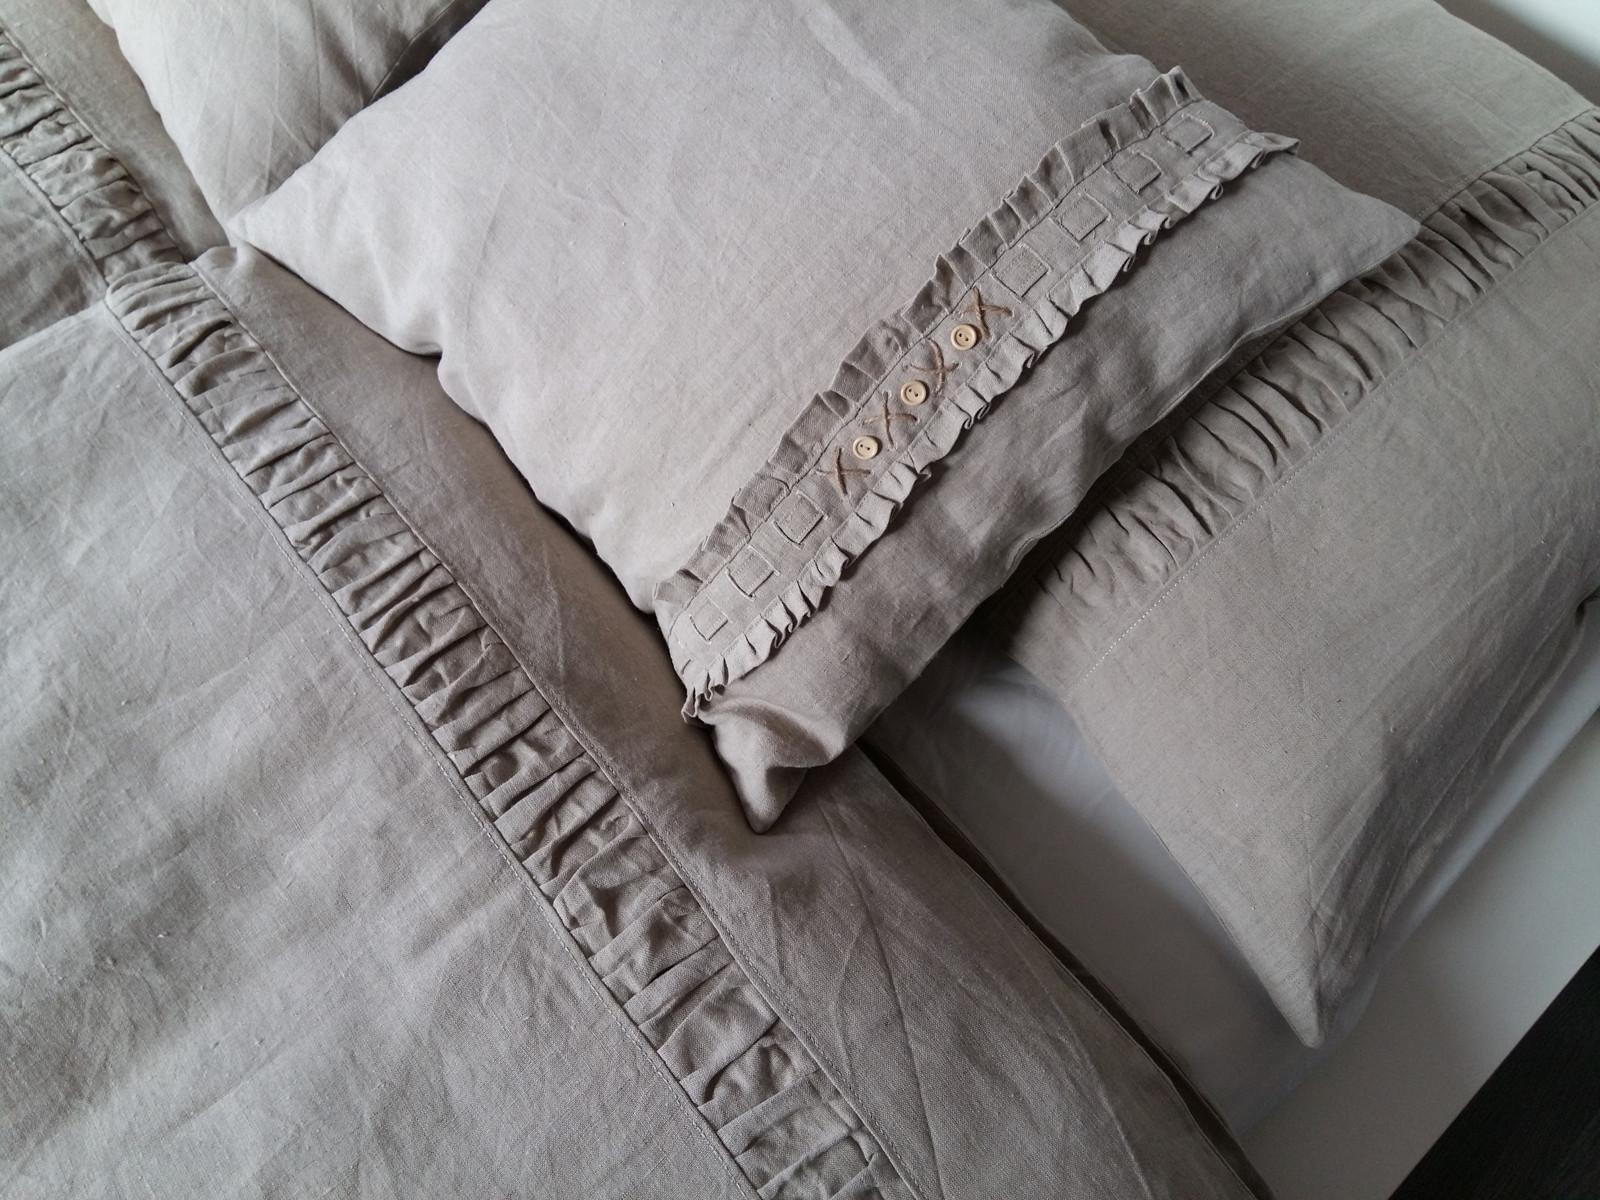 "<span>Ľanové posteľné obliečky Nature Dream | <a href=""https://static2.flercdn.net/products/dd2/f/16/88/07228816_qholoflfvagxkn.jpg"" target=""_blank"">Zobrazit plnou velikost fotografie</a></span>"